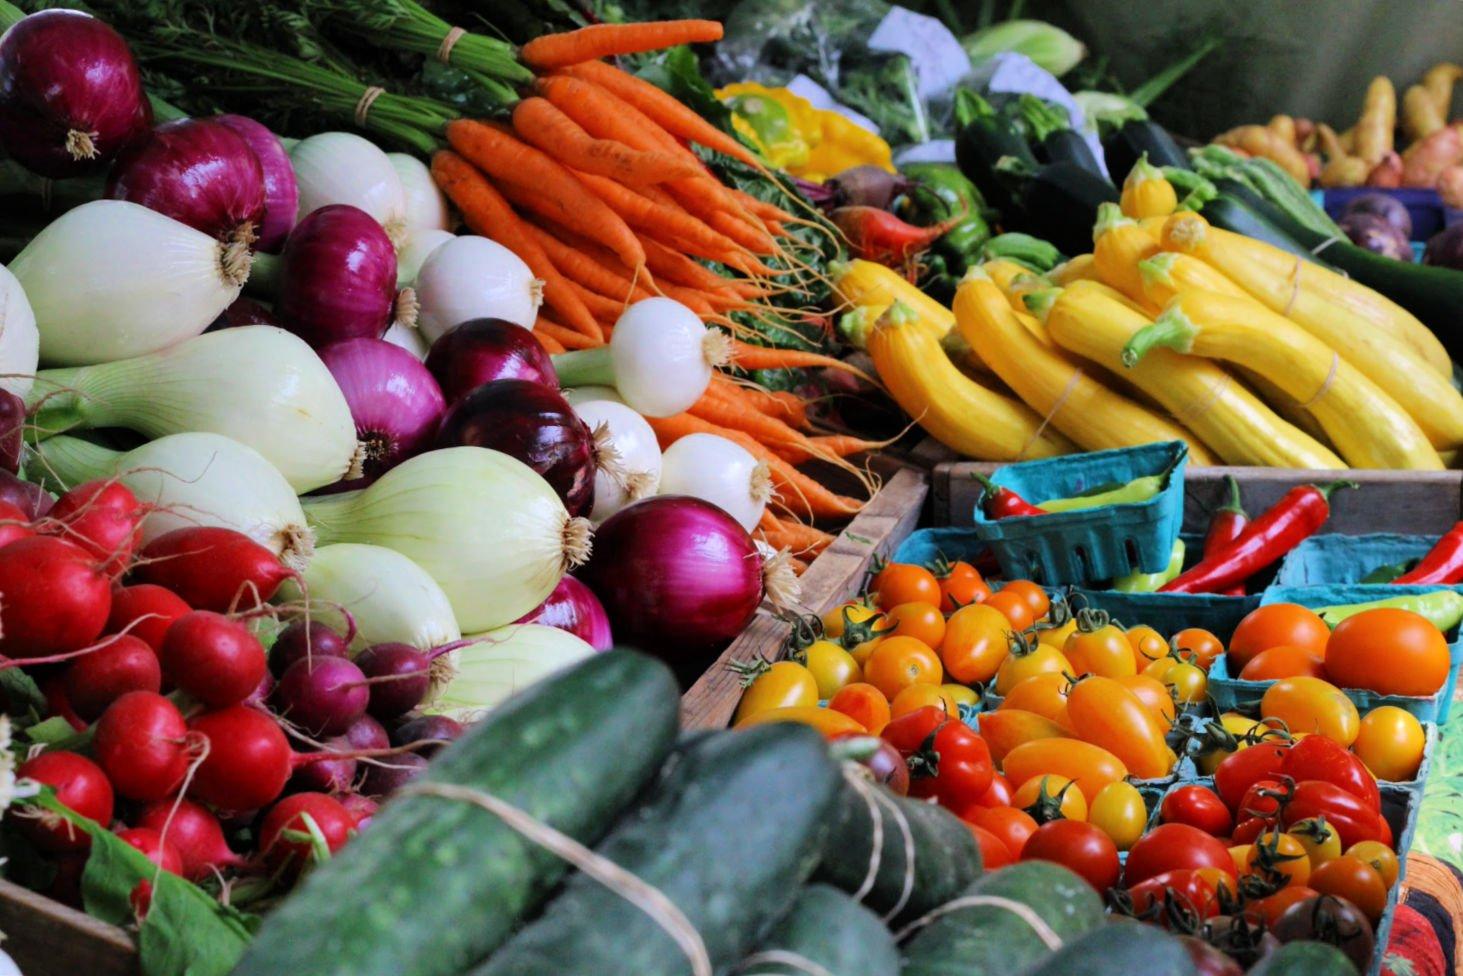 Farmers Market Vegetables in Boise Idaho